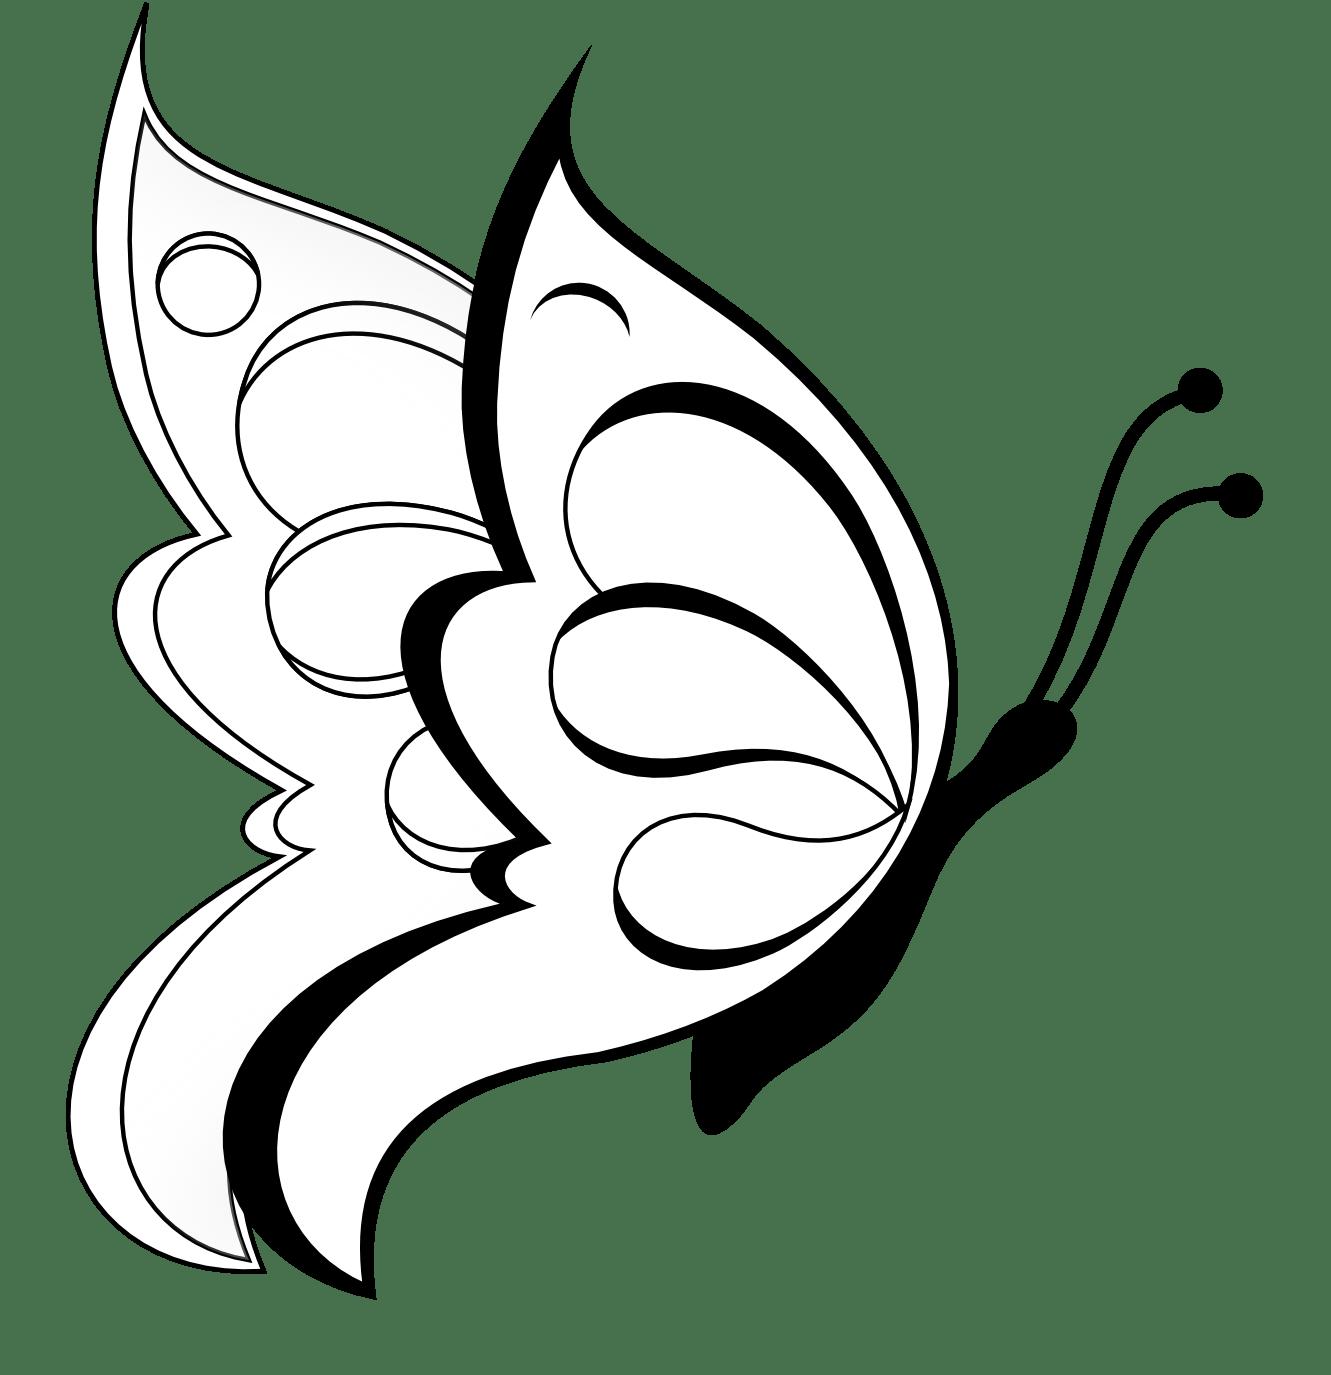 Desenhos De Borboletas Lindas